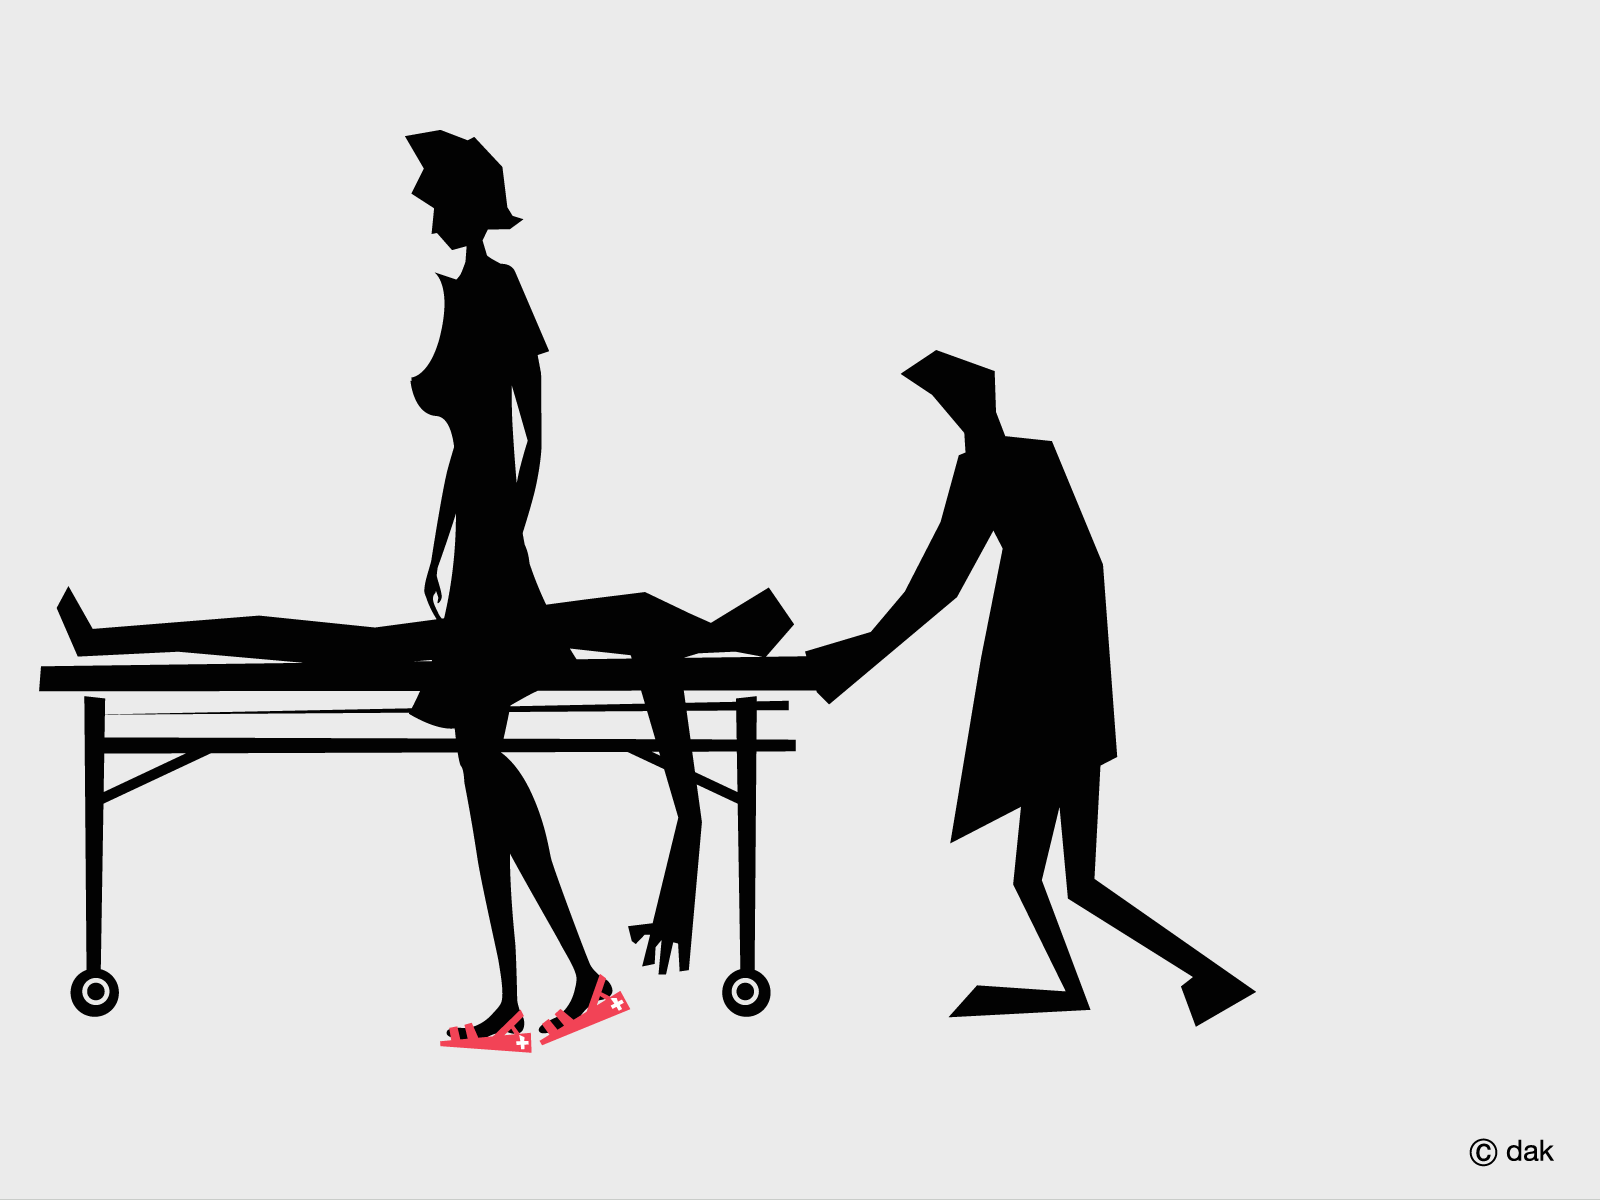 nurse wallpaperfree desktop wallpaper backgrounds illustration